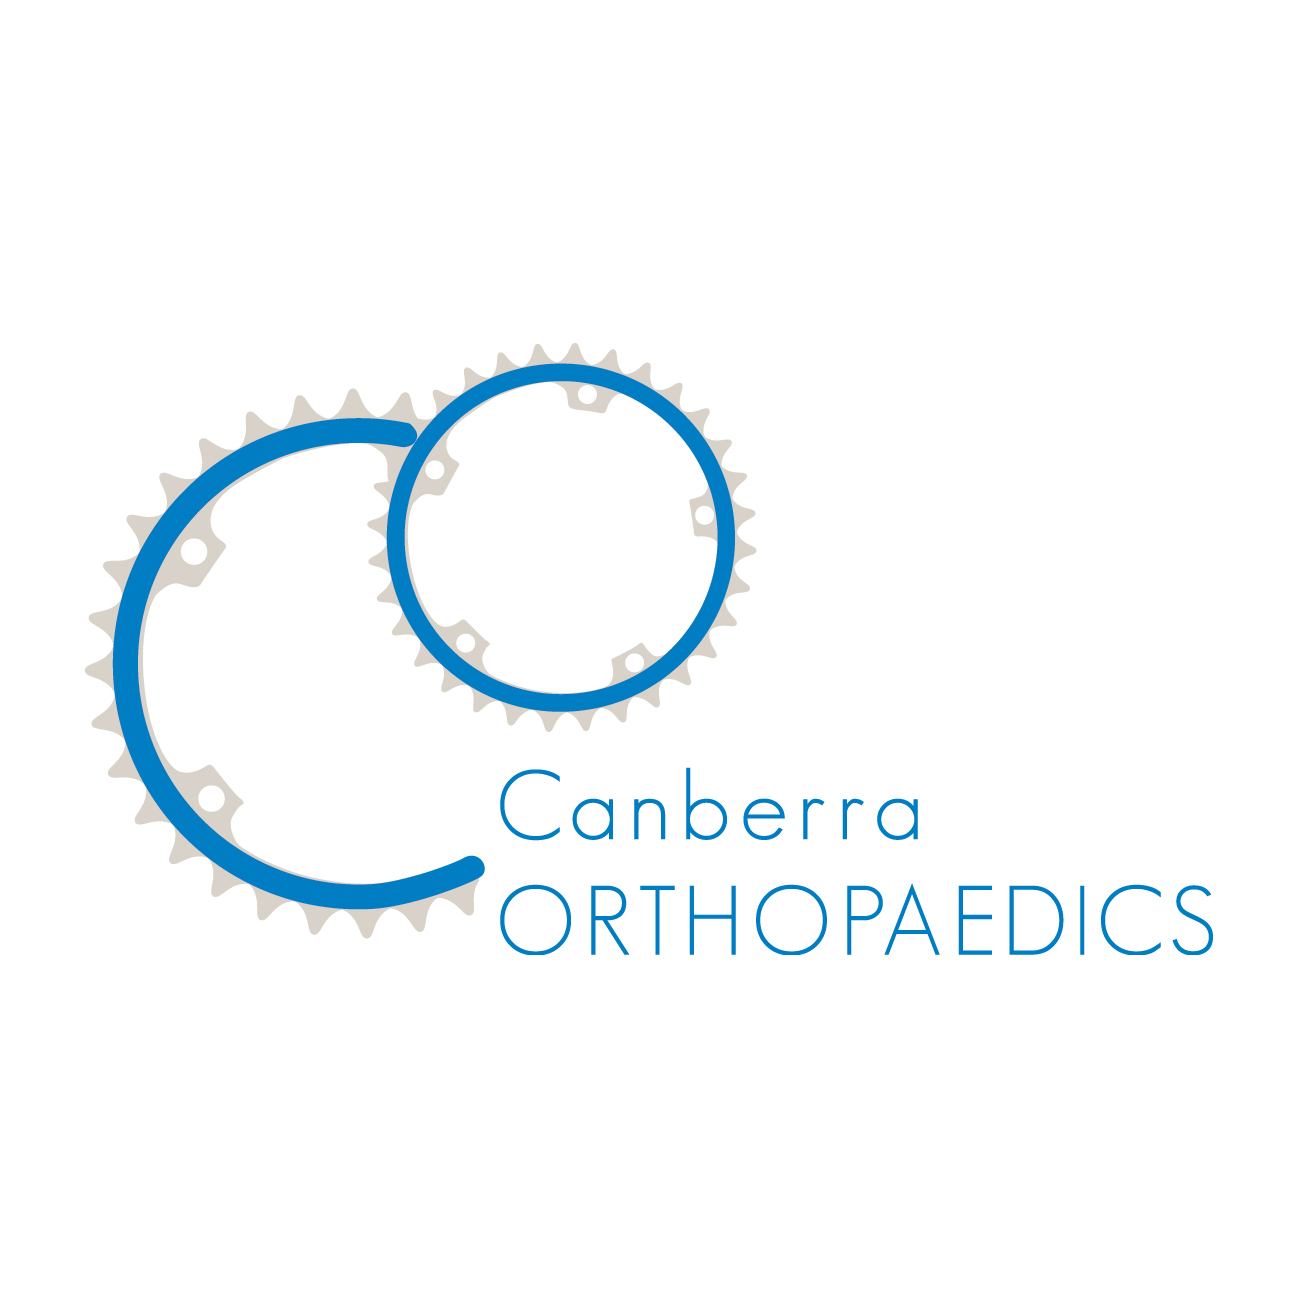 CanberraOrthopaedisLogo_SQ.jpg